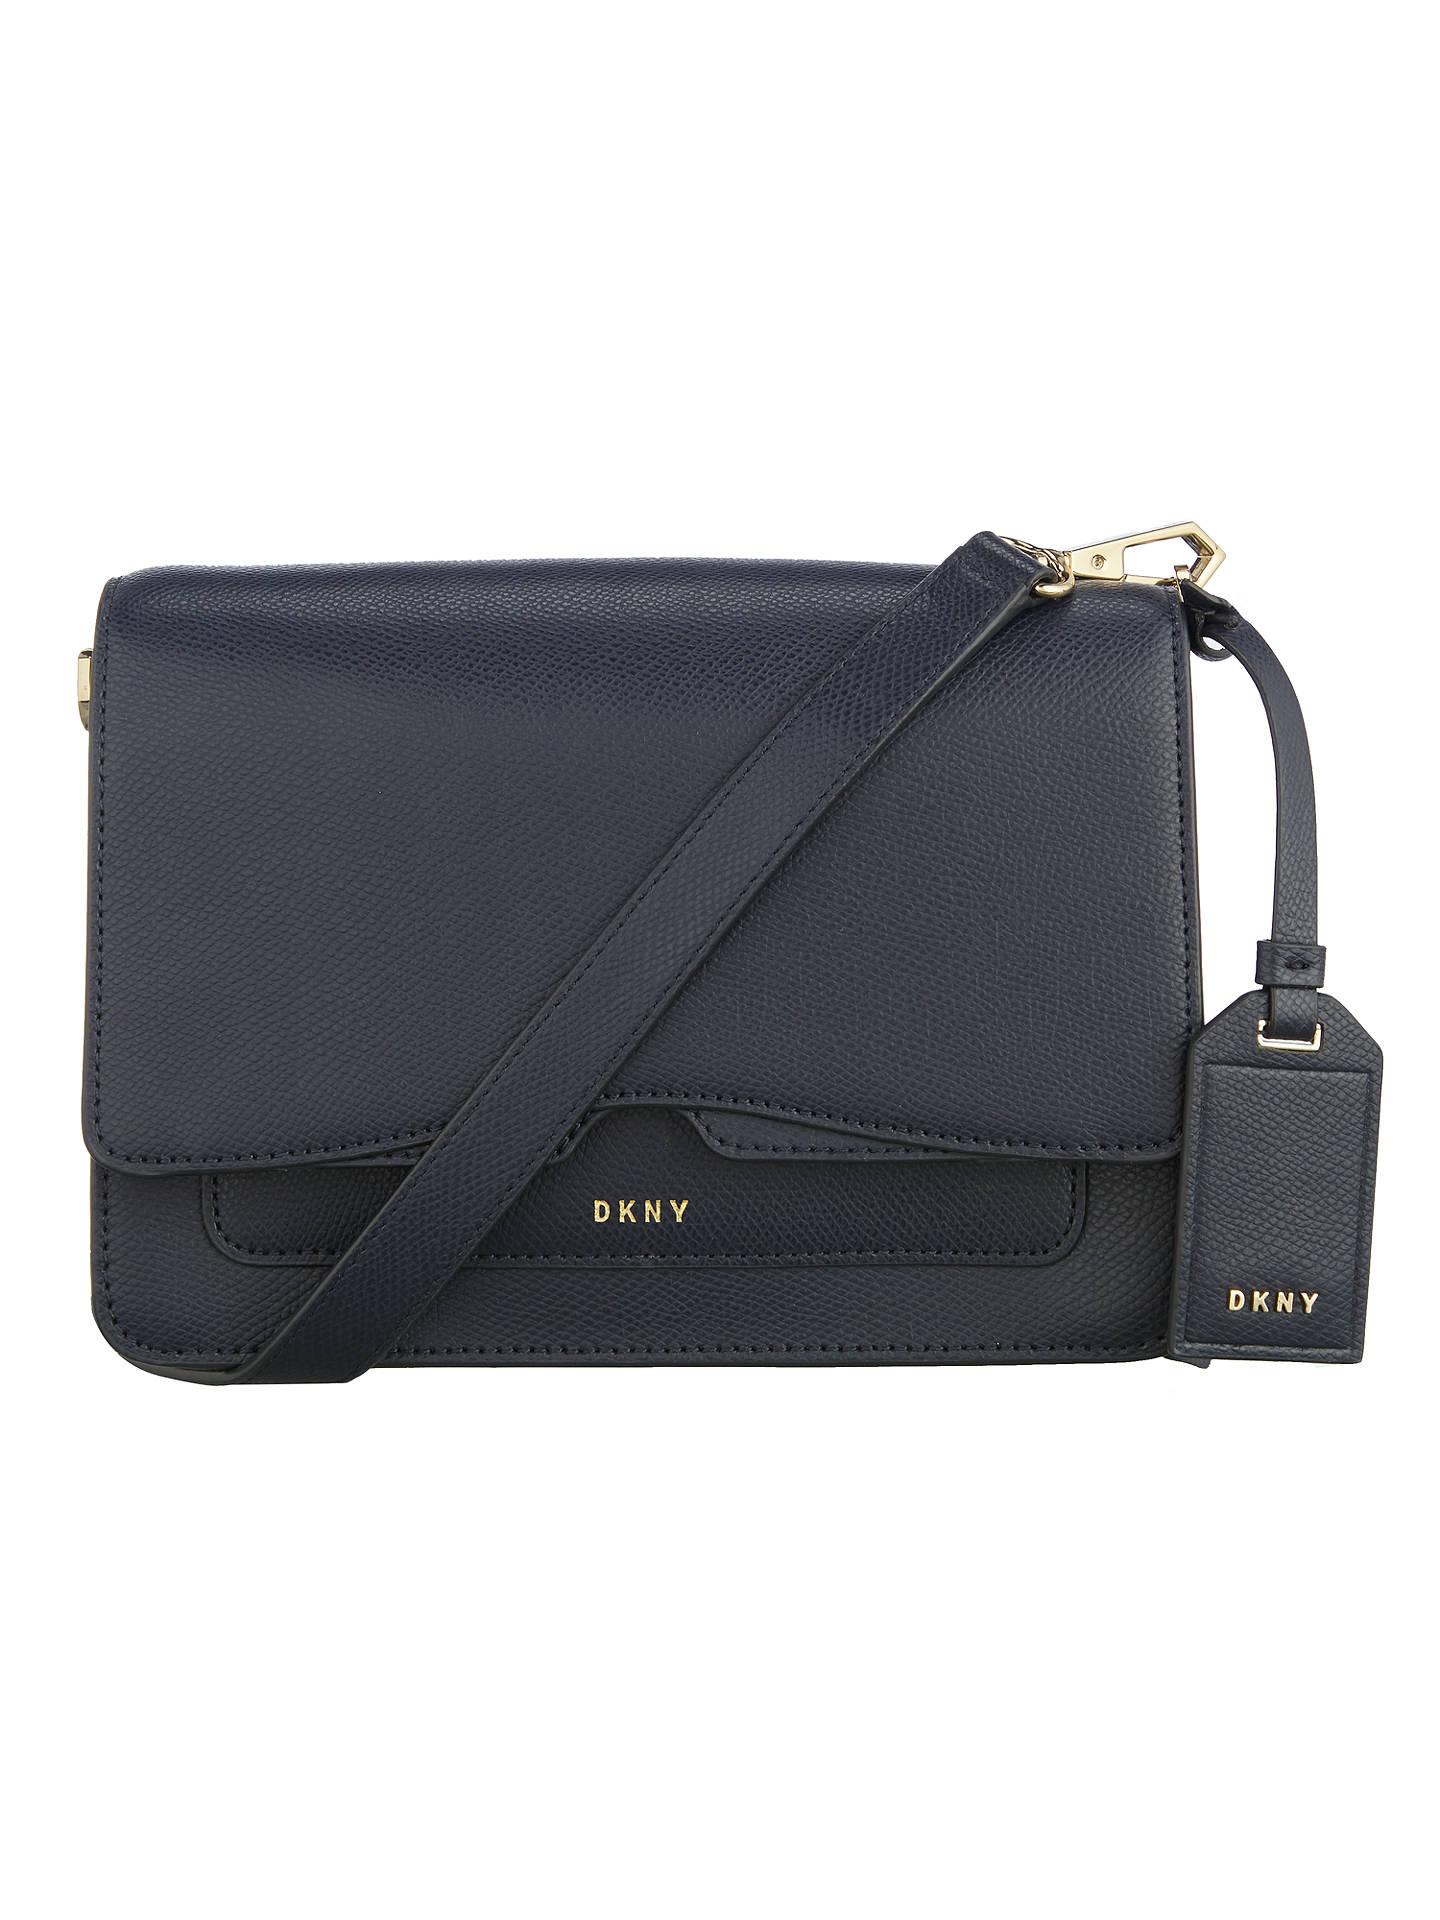 6a4ec09318 Buy DKNY Bryant Park Saffiano Leather Flap Cross Body Bag